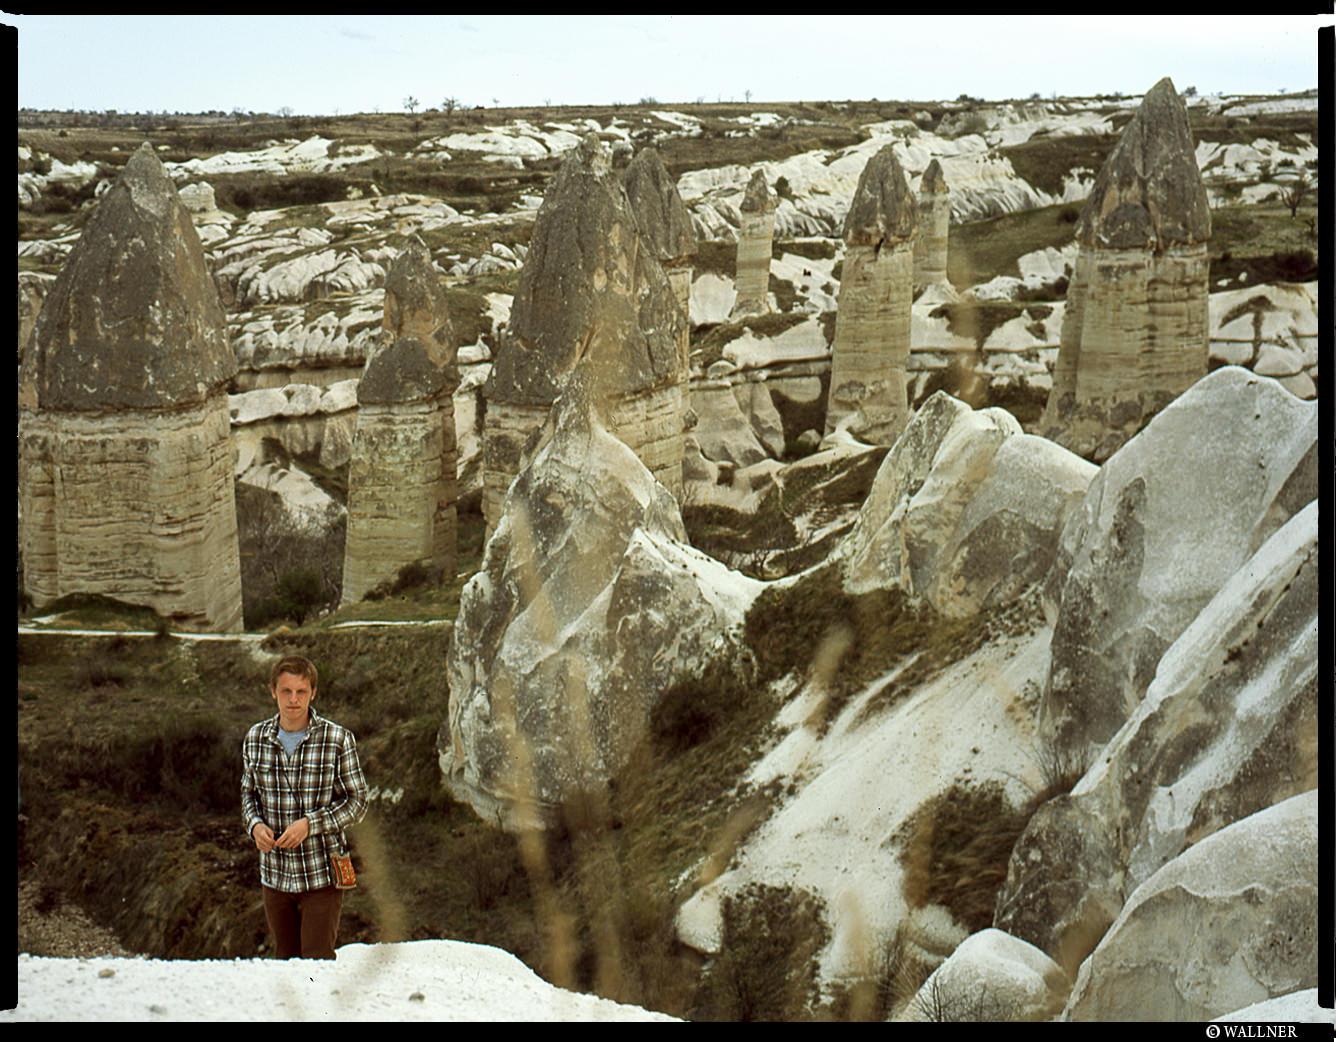 MediumFormatPatrikWallner_Cappadocia_CarpeDiemStasLOWQ